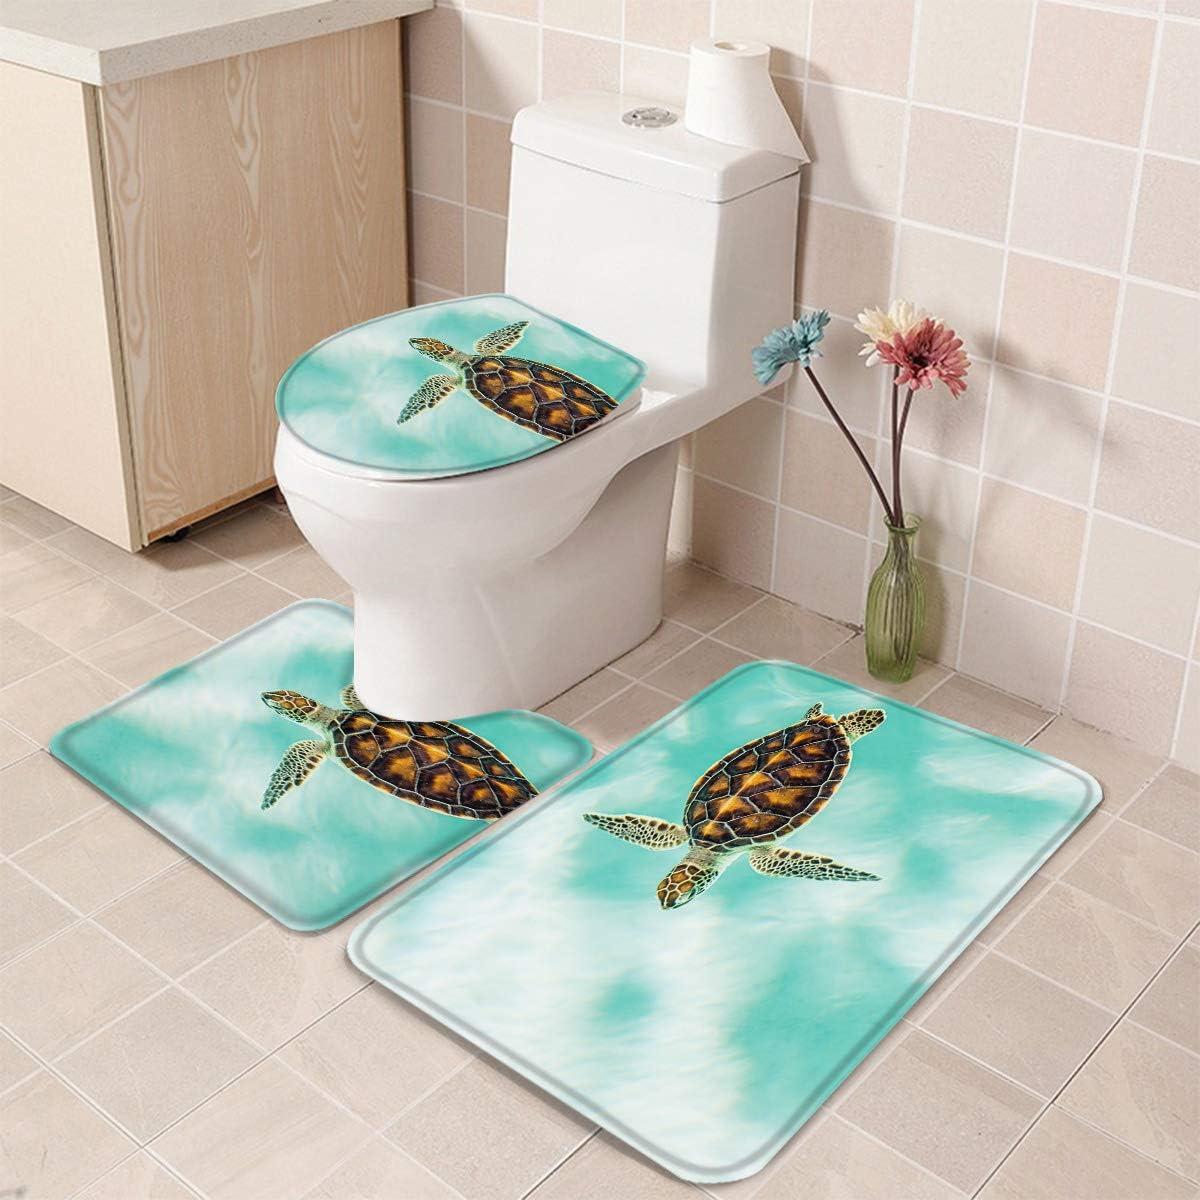 Pedestal Mat and Toilet Lid Cover,Non-Slip Bathroom Floor Mat Queenker 3 Pieces Bath Rug Set Toilet Seat Cover Shark and Starfish Print Contour Rug